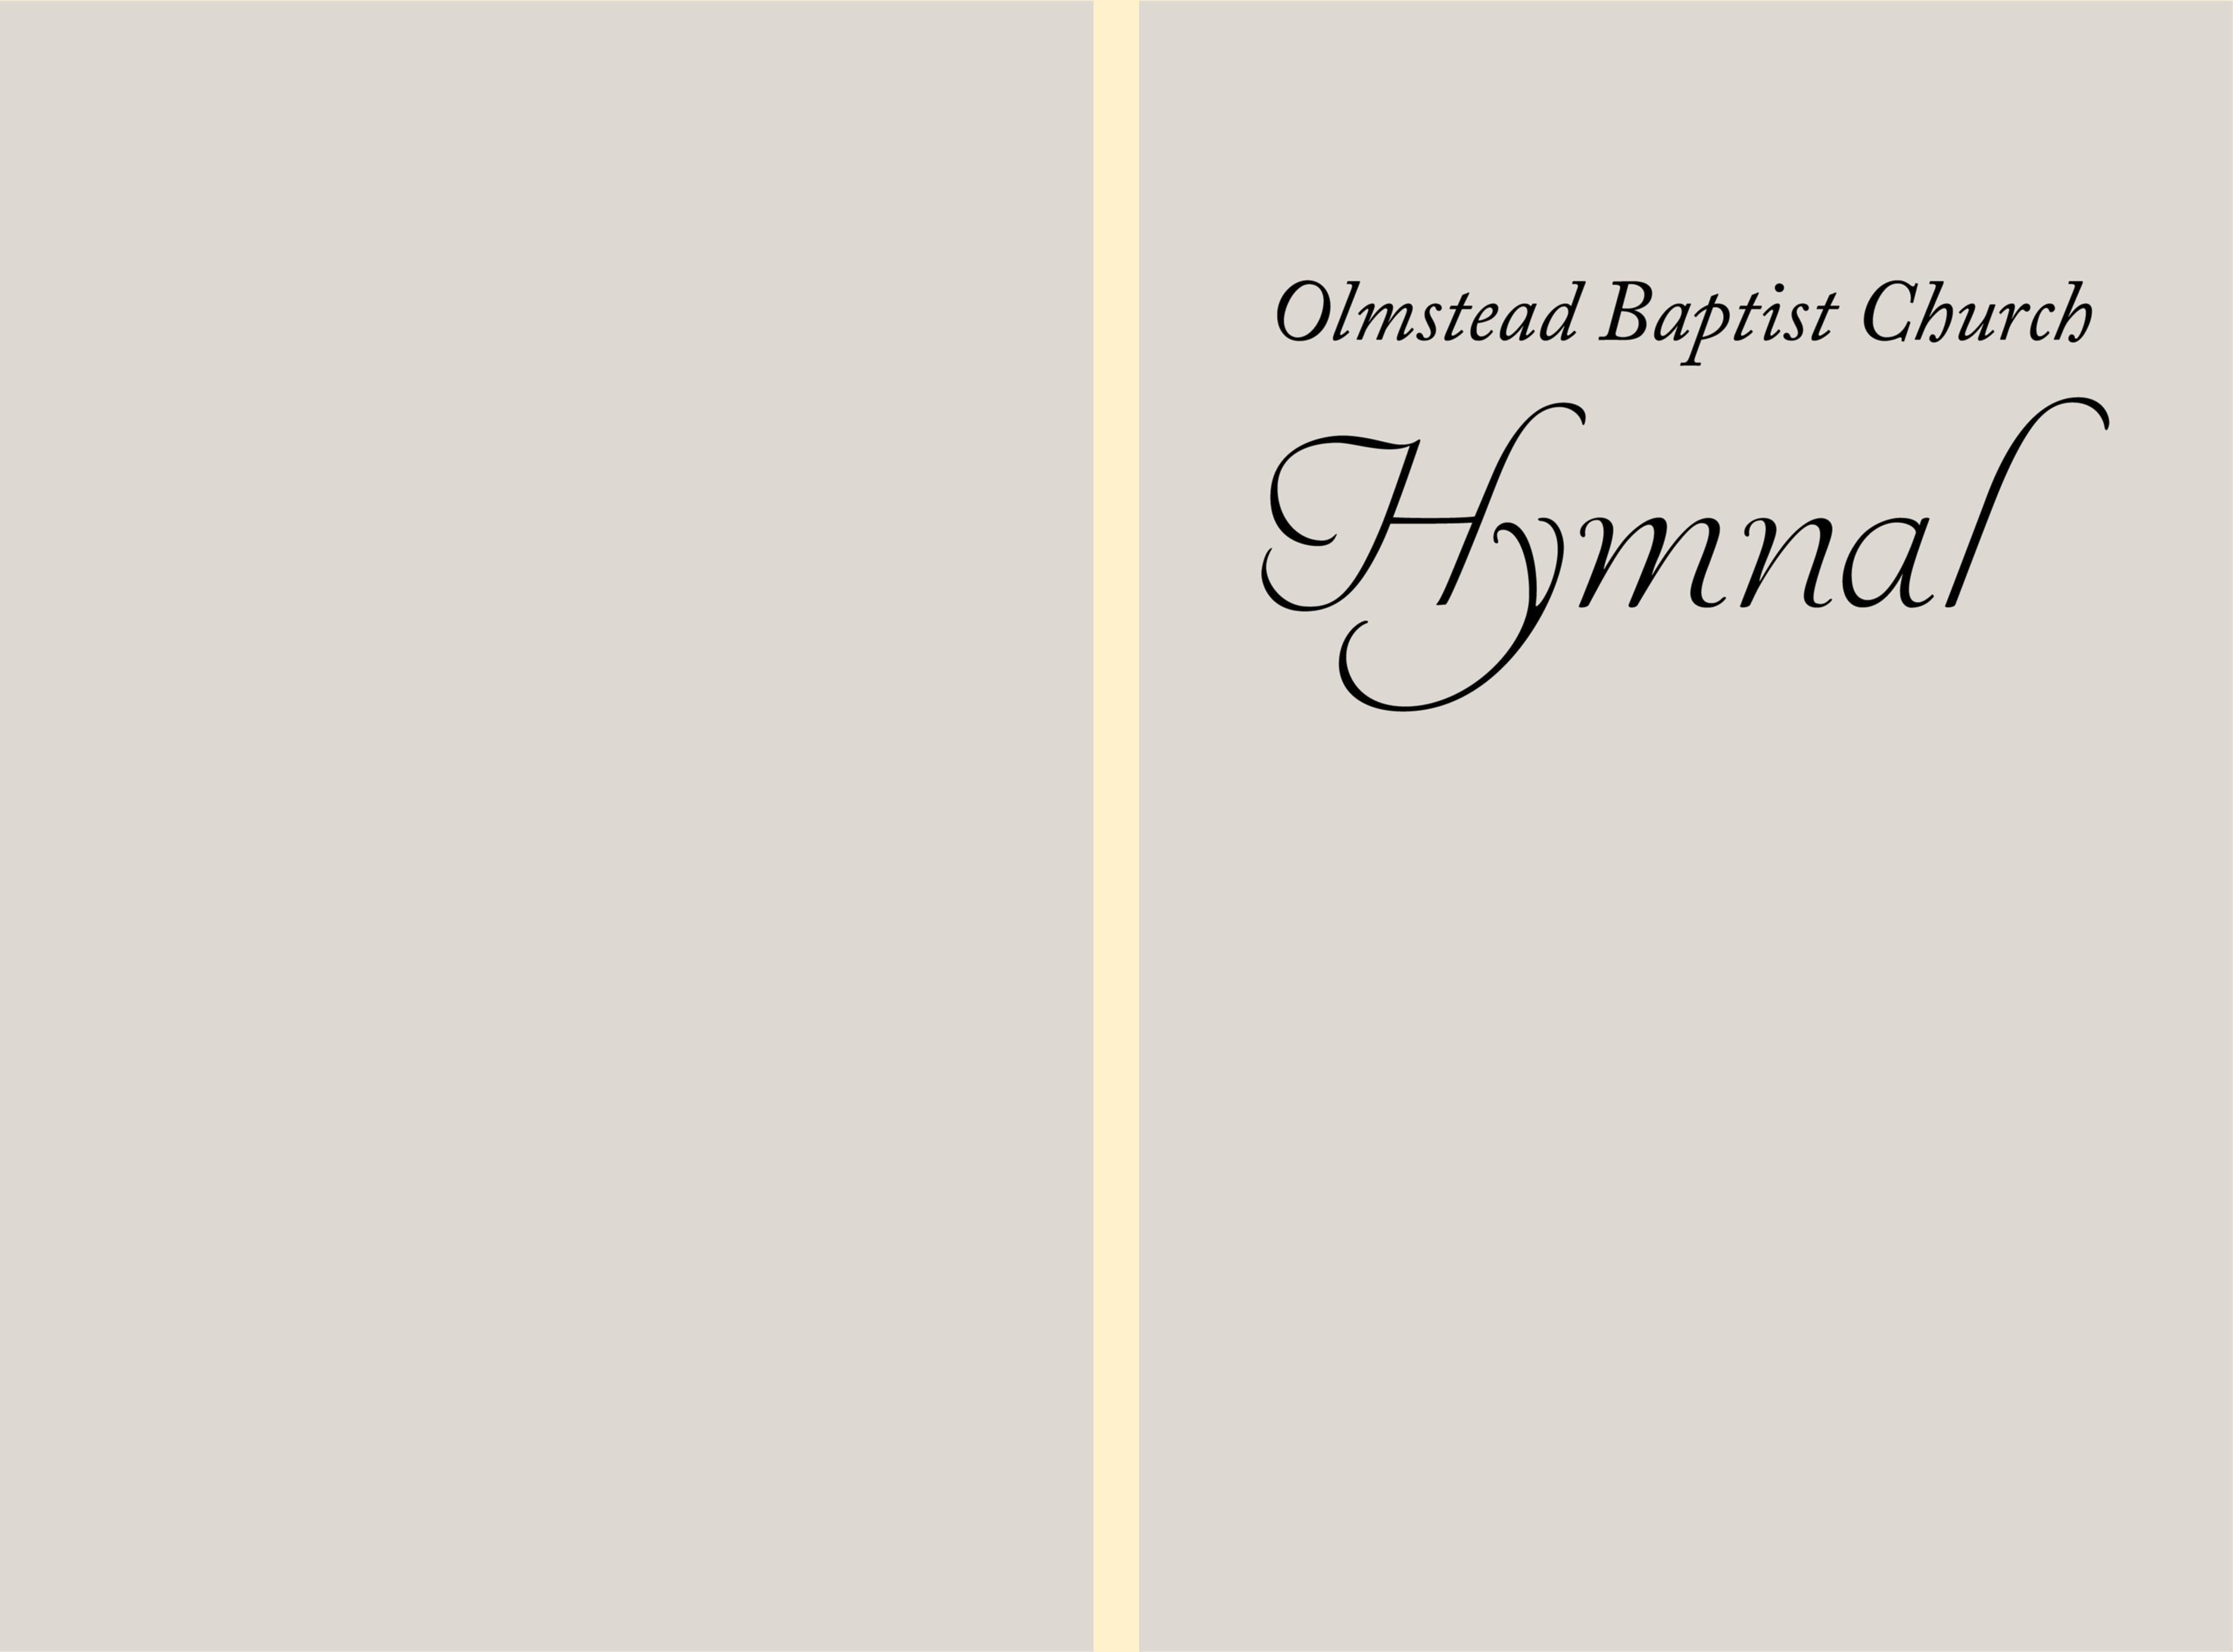 Olmstead Baptist Church Hymnal by Olmstead Baptist Church